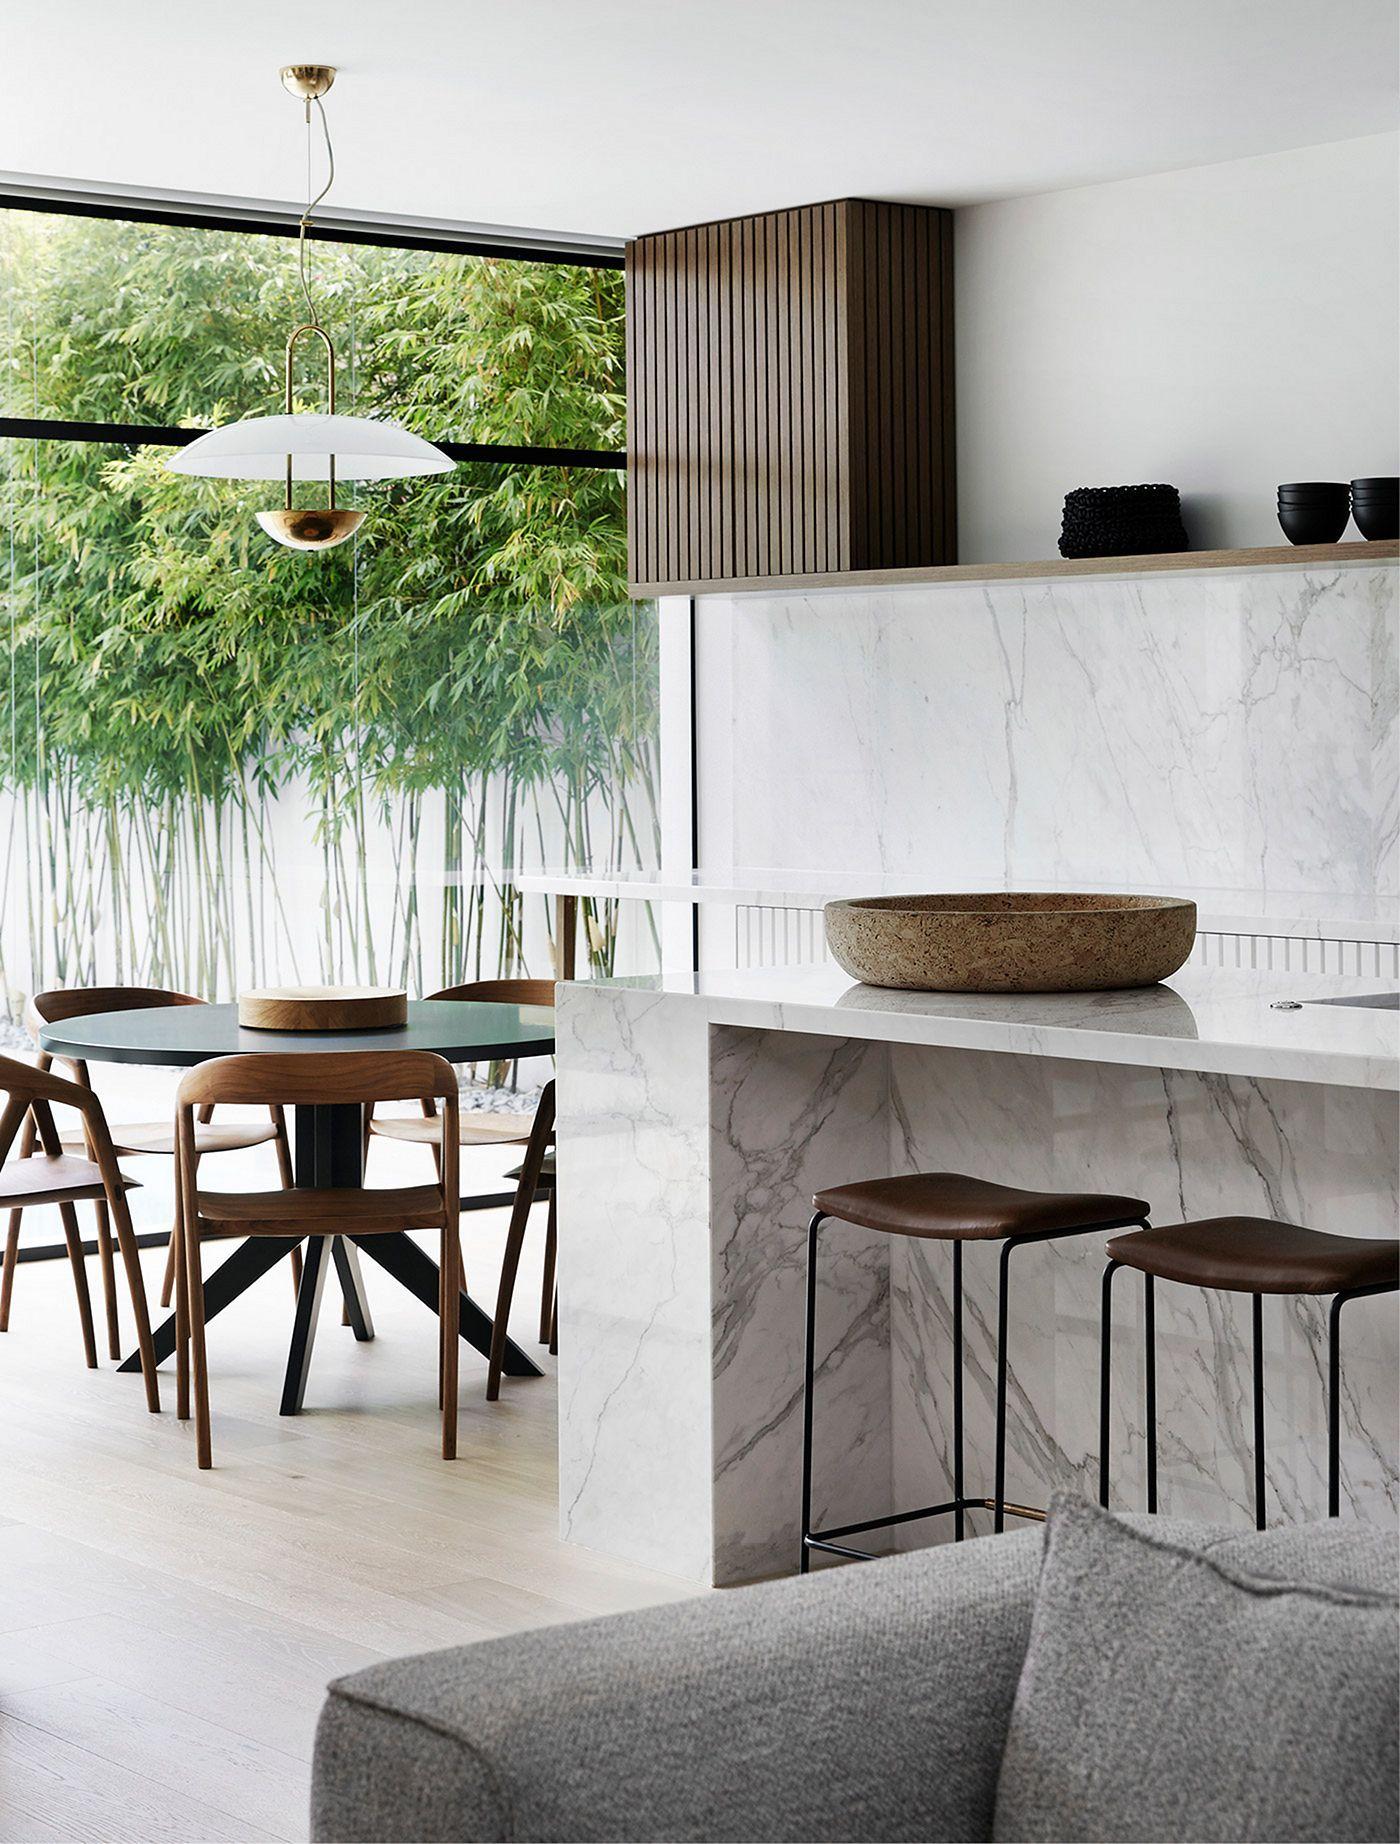 Ordinaire Gorgeous Minimalist Home Decor Ideas